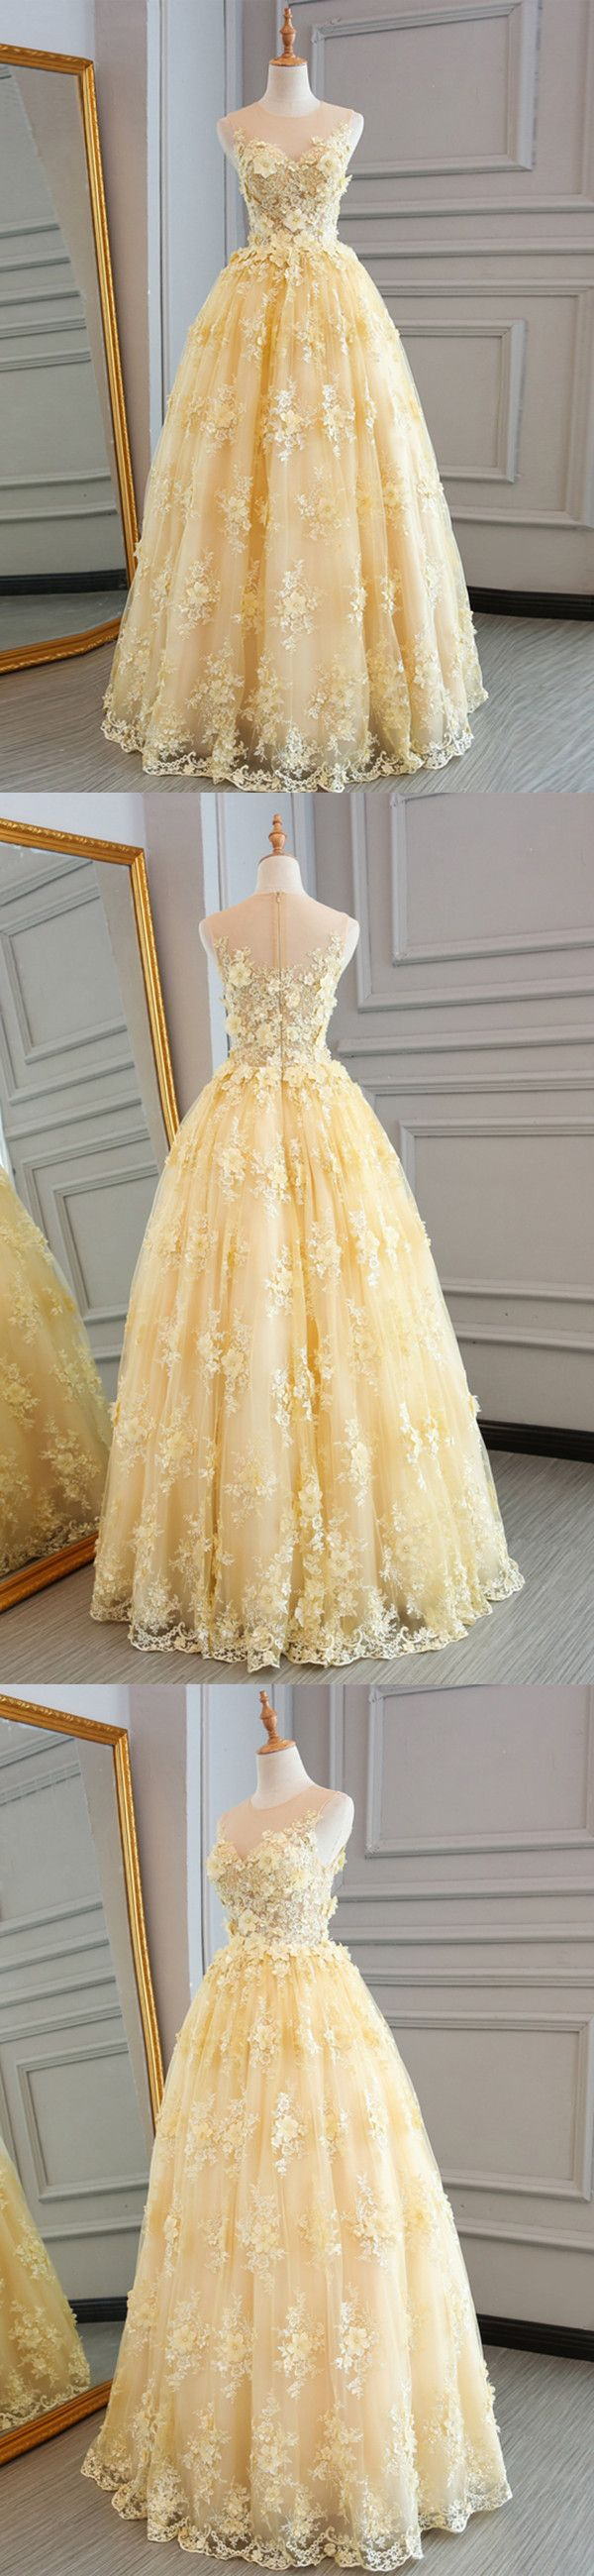 prom dresses long,prom dresses modest,prom dresses simple,prom dresses cheap,african prom dresses,prom dresses 2018,prom dresses graduacion,prom dresses a line,prom dresses yellow,prom dresses lace #demidress #promdress #promdresses #promdresslong #fashion #womensfashion #longpromdresses #yellow #lace #lacedress #laceweddingdresses